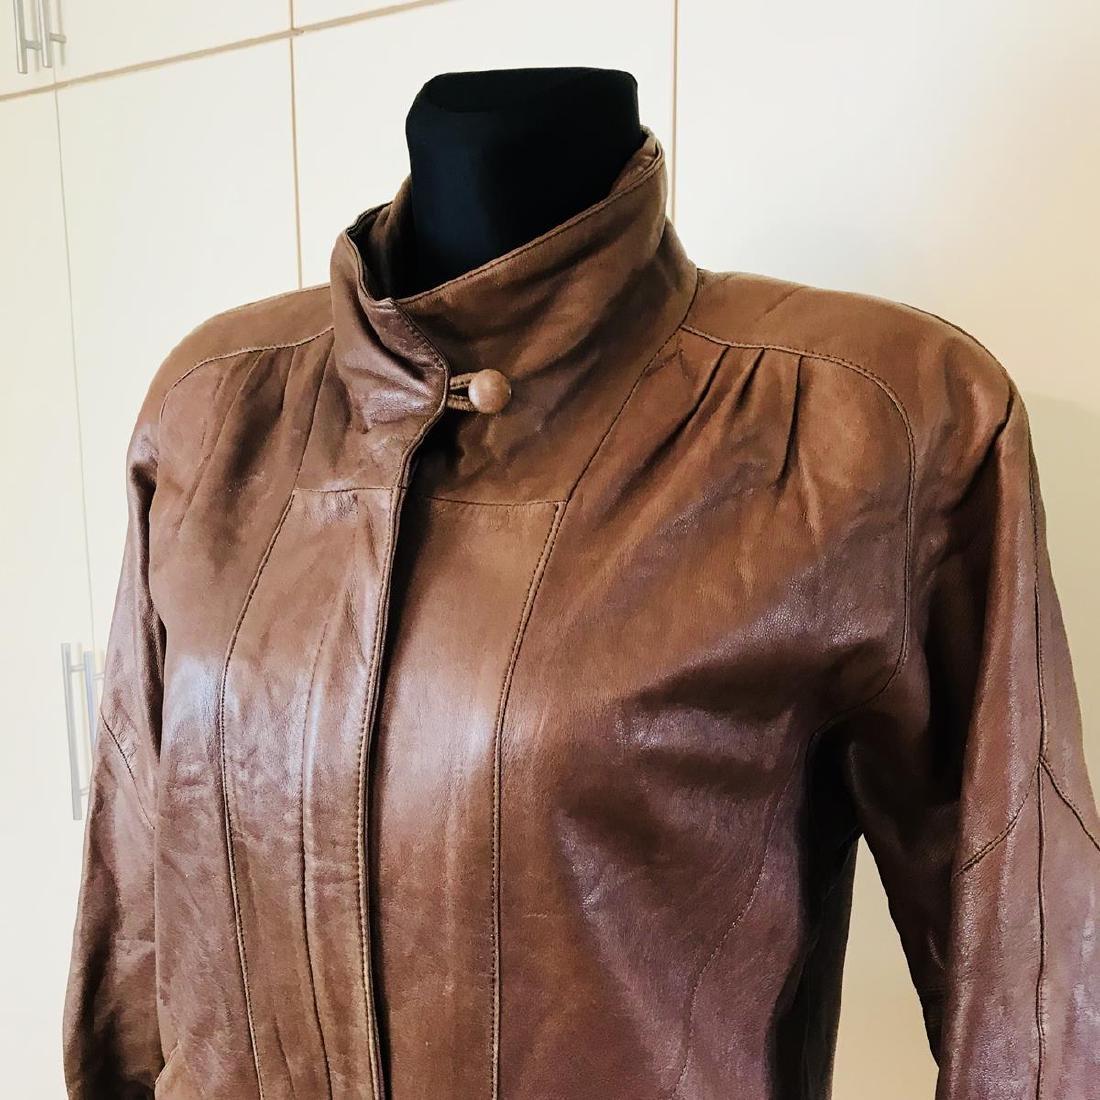 Vintage Women's Leather Jacket Coat - 2